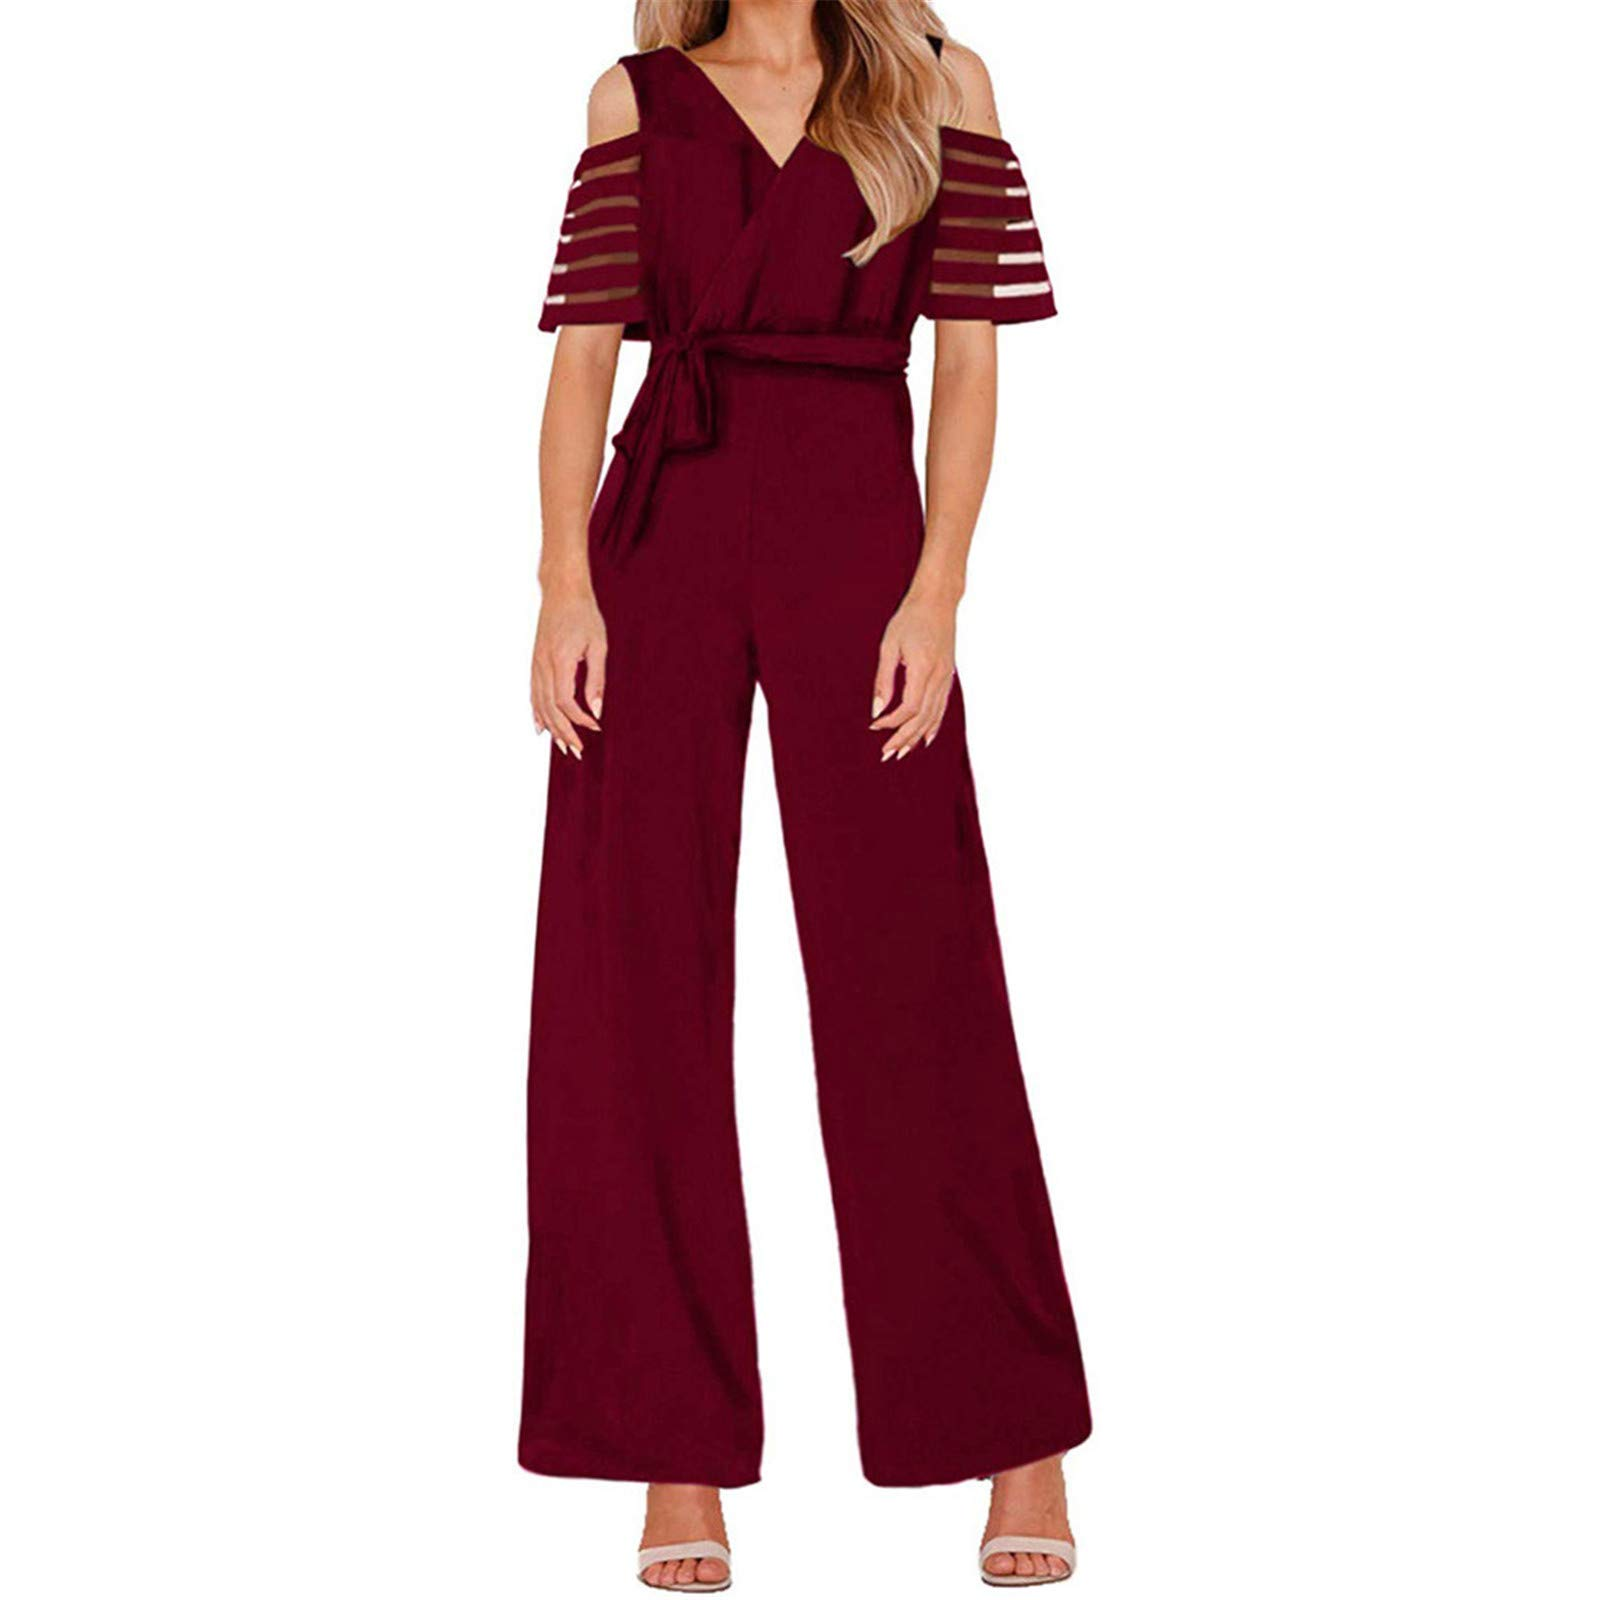 Thenxin Office Lady Jumpsuit V Neck Cold Shoulder High Waist Wide Leg Long Romper with Belt(Red,S)